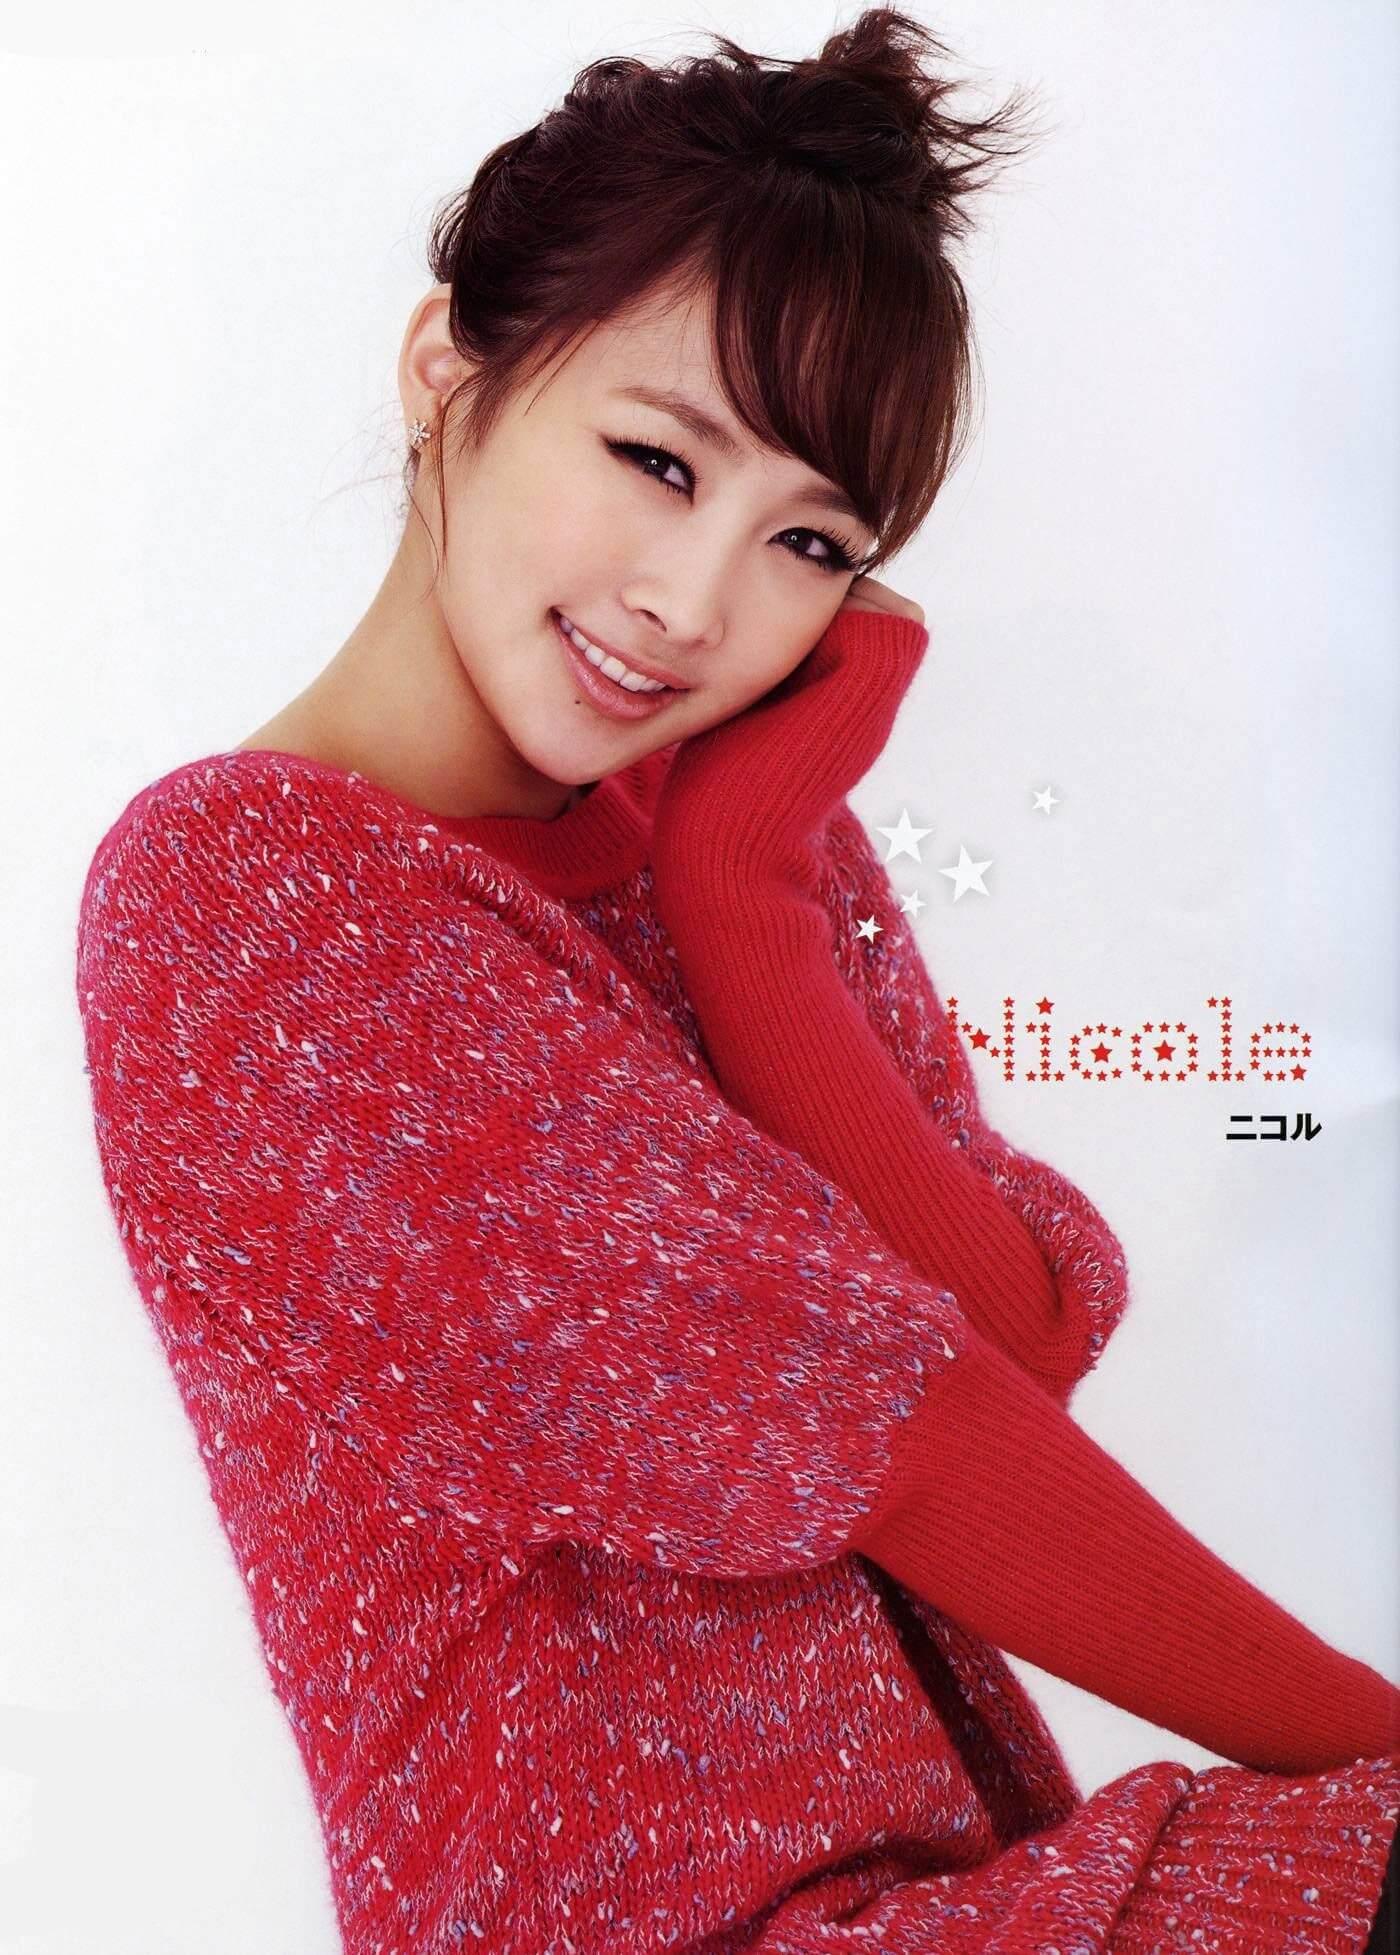 50 hot photos of nicole jung  12thblog